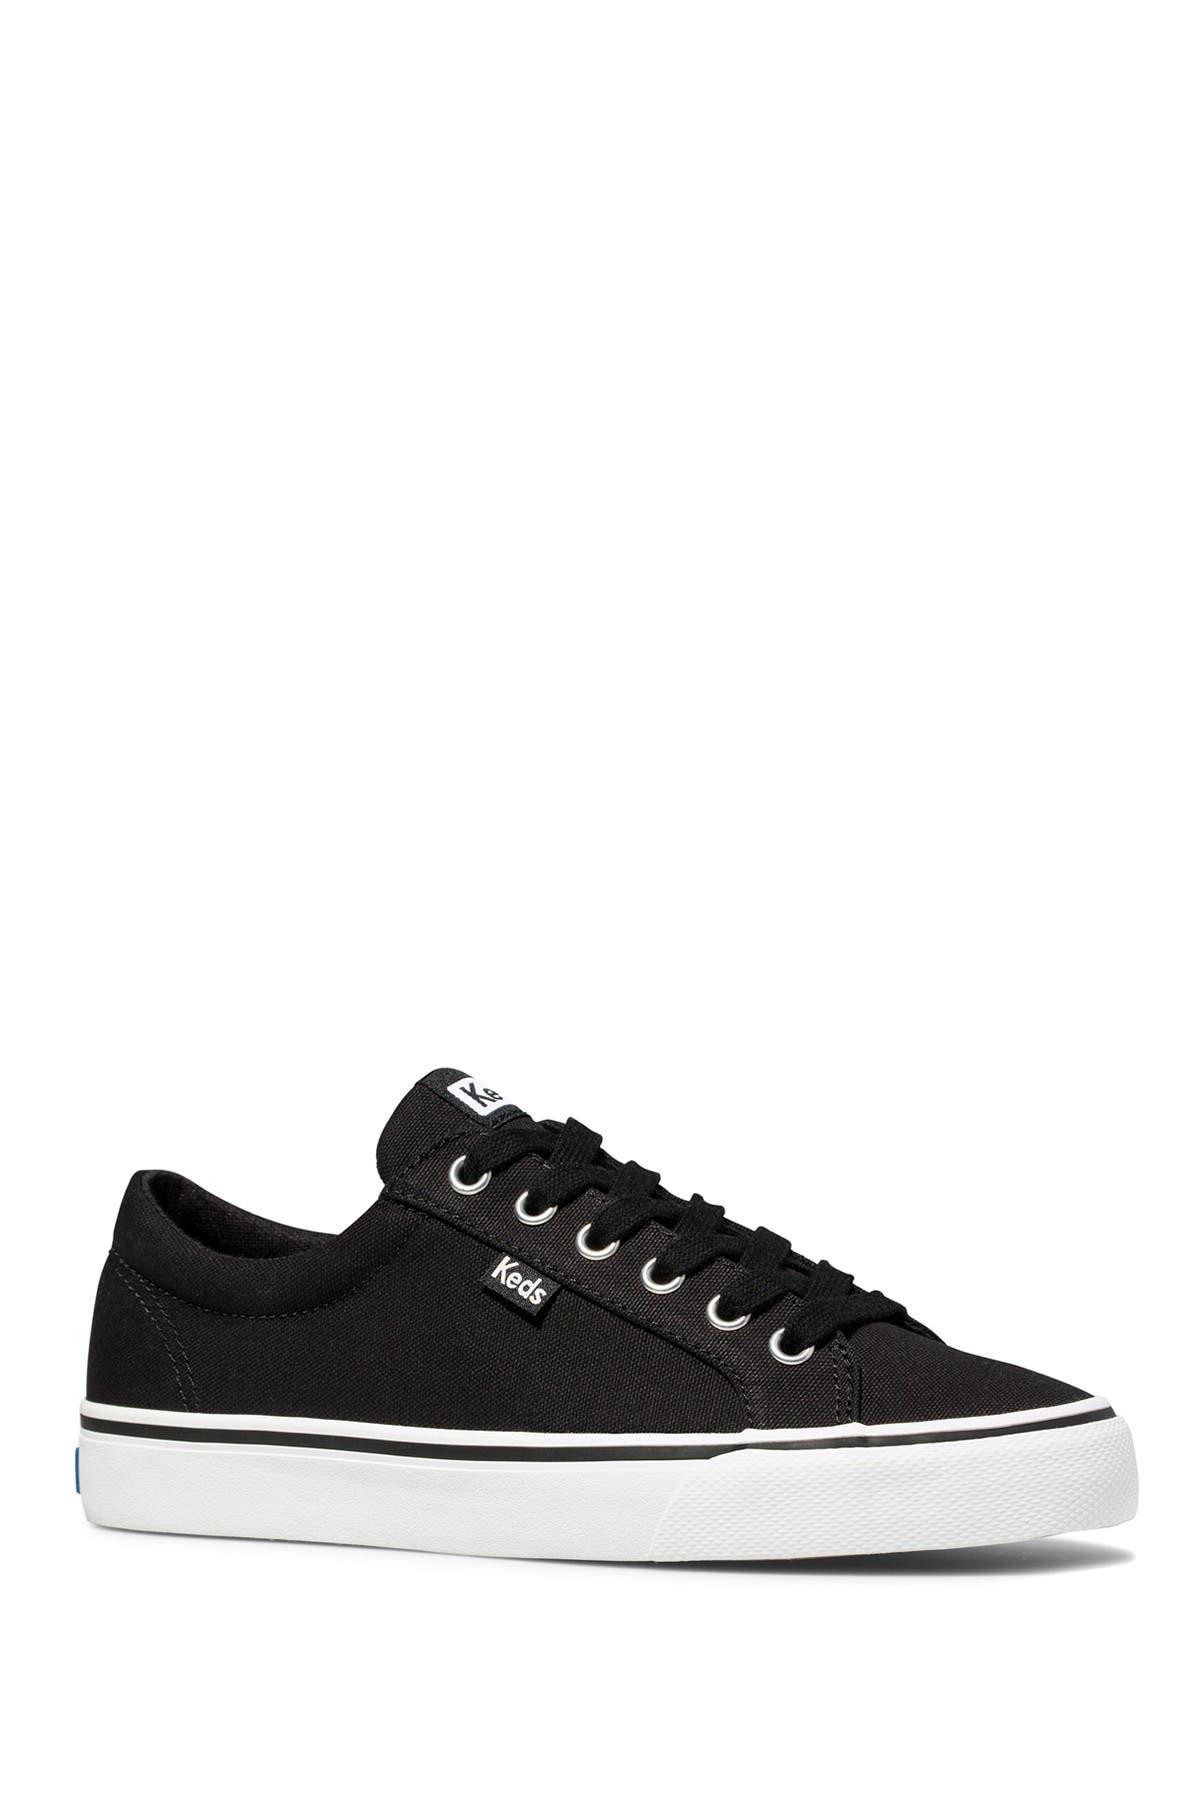 Image of Keds Jump Kick Lace-Up Sneaker